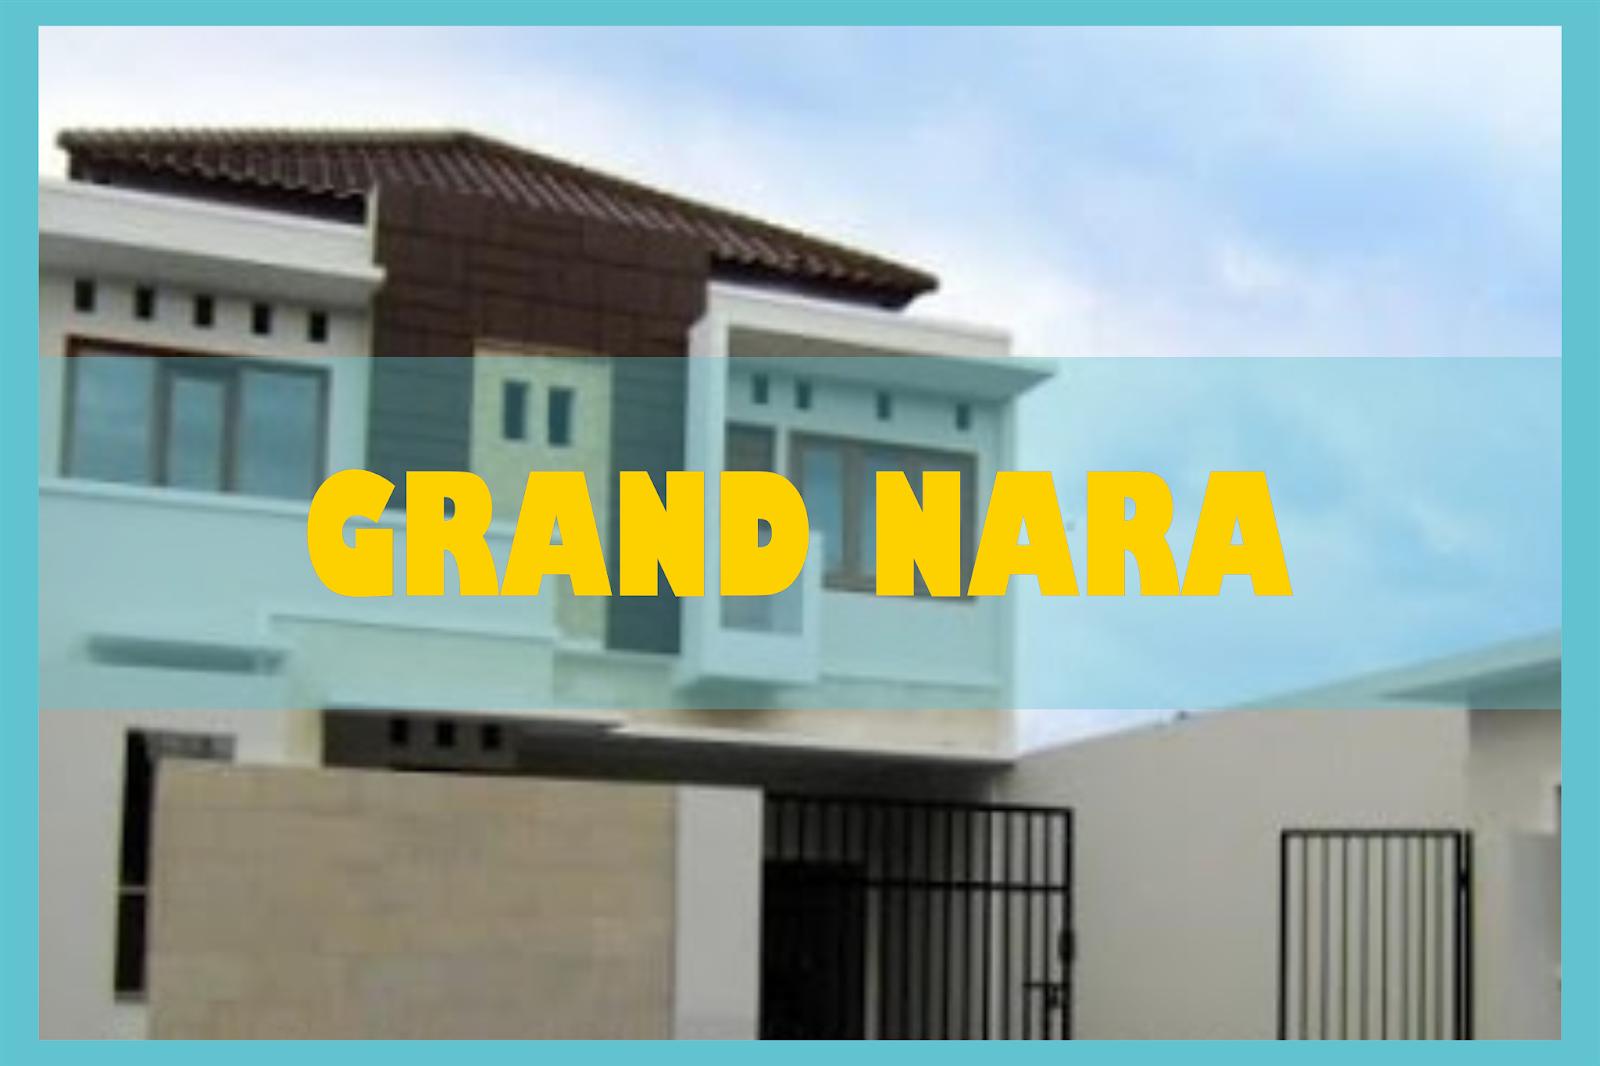 GrandNara